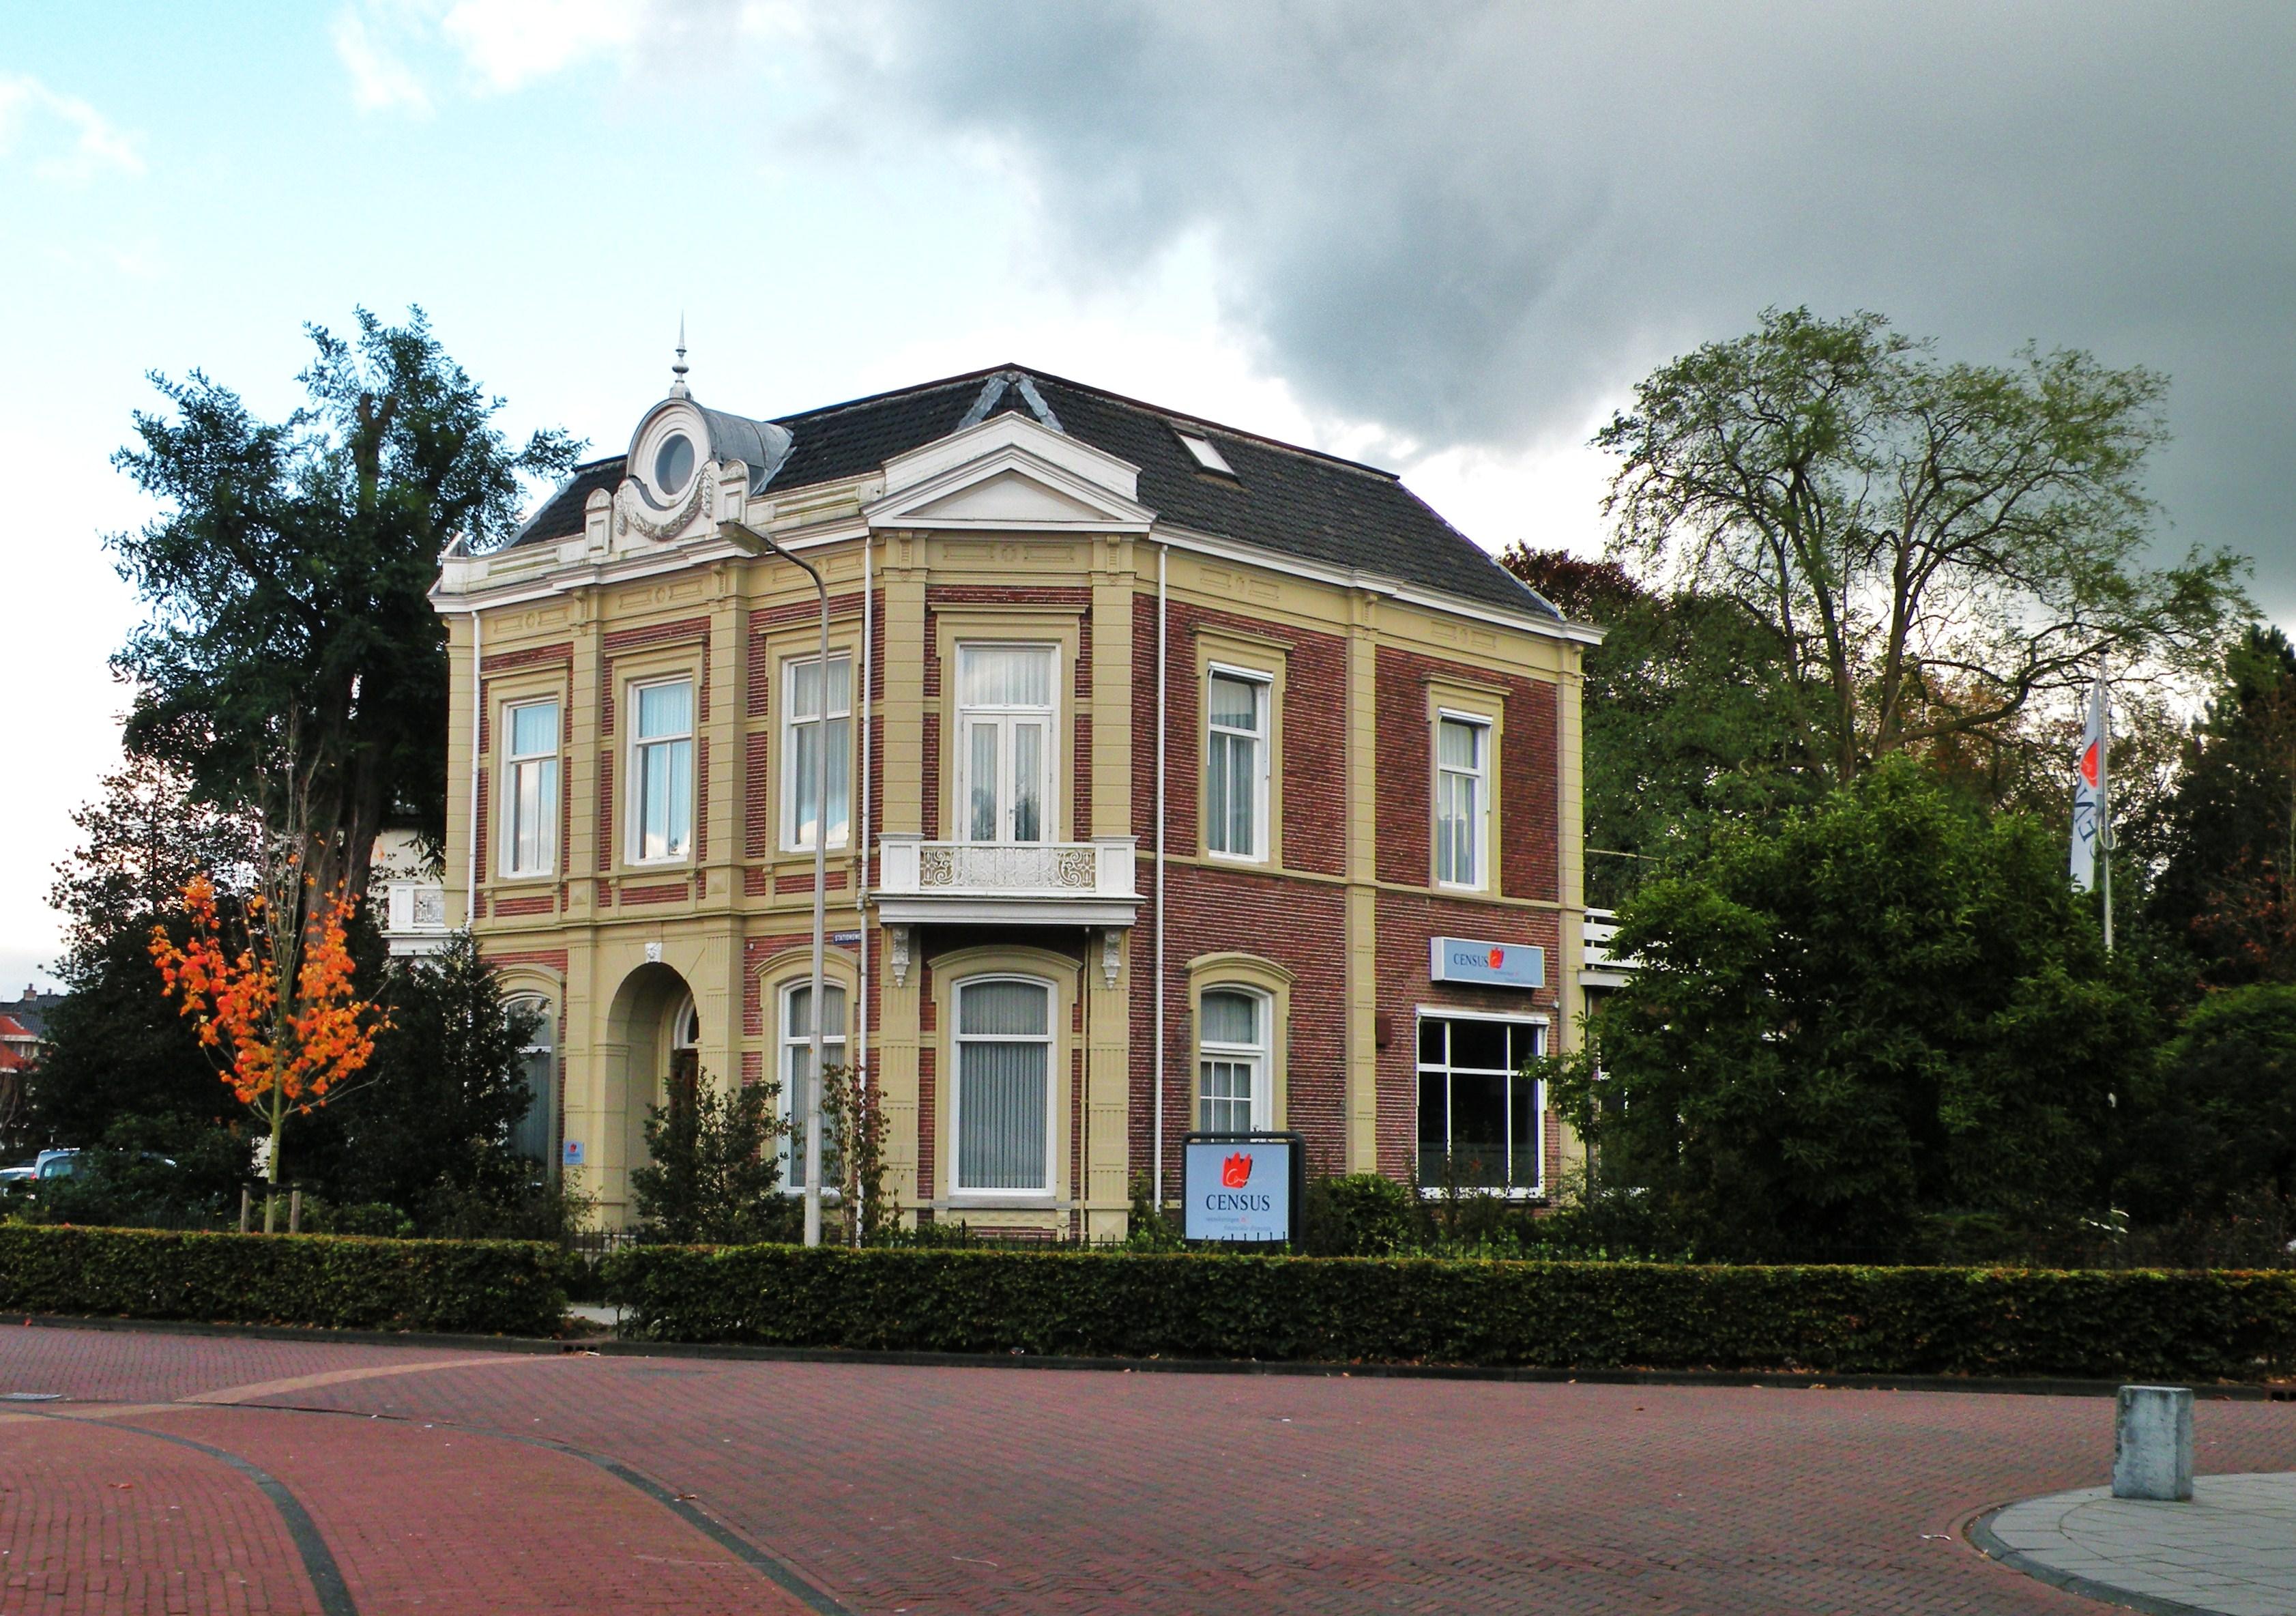 Aangeboden door: Stichting Microtoerisme InZicht Fotoblog Meppel Stationsweg 2 monument